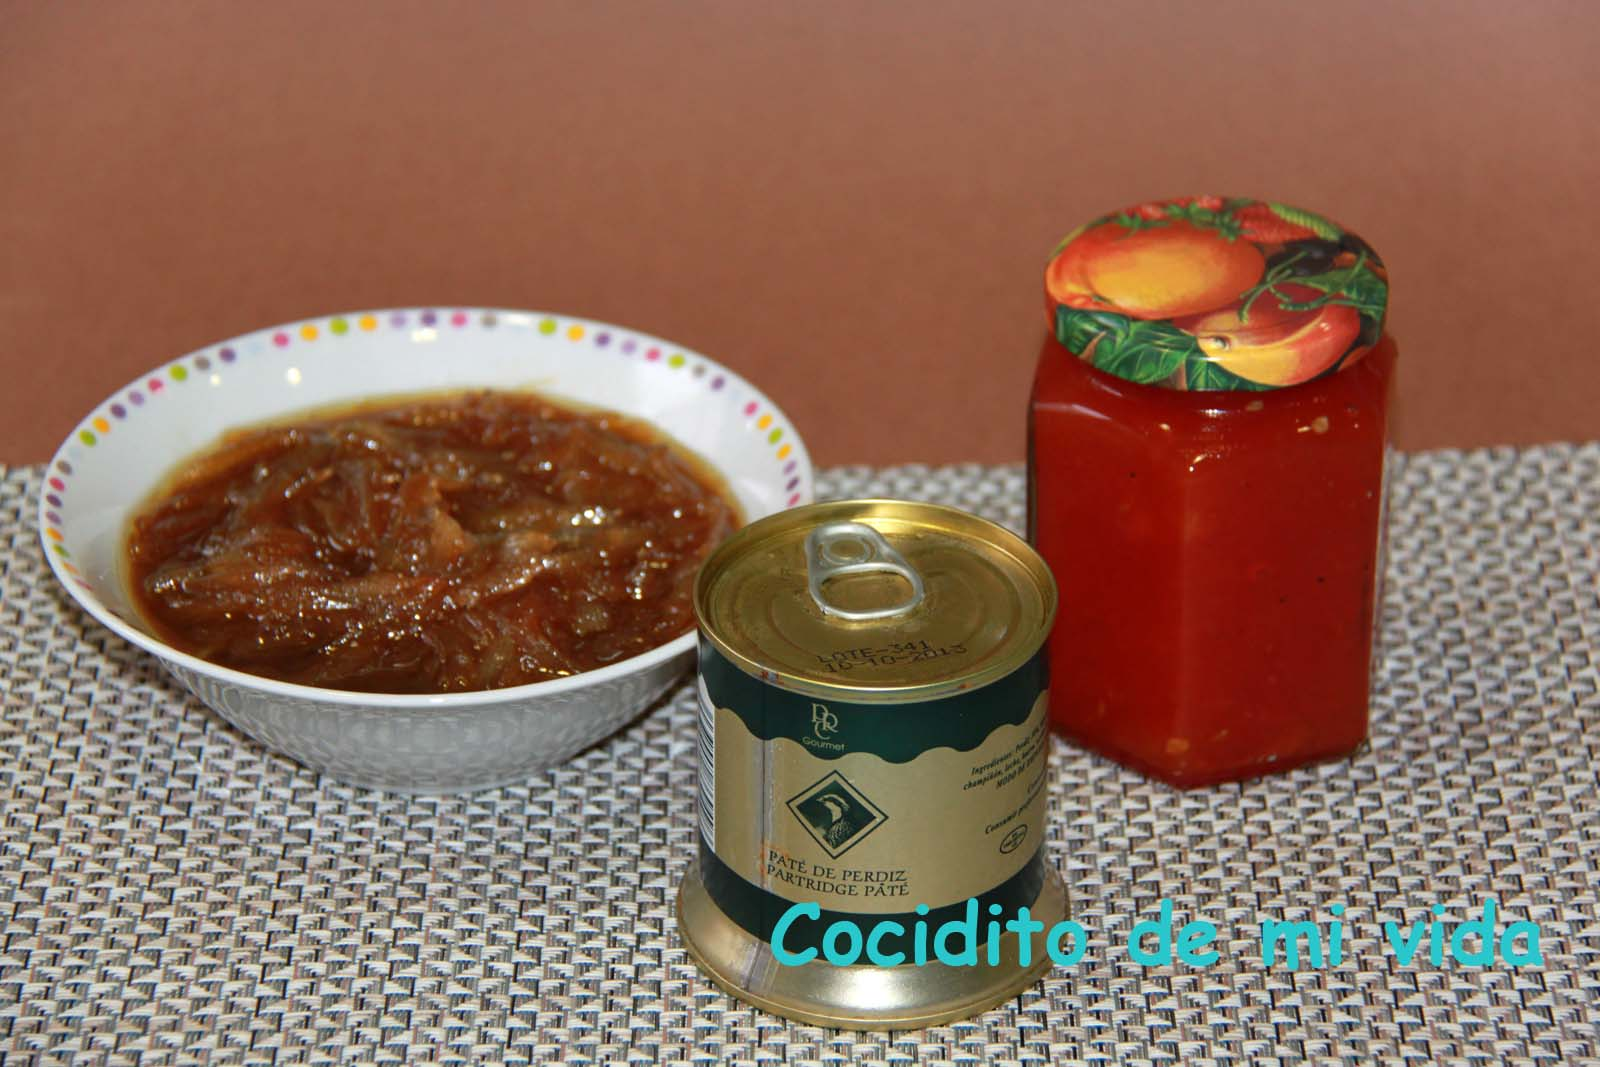 Cocidito de mi vida canap s de pat de perdiz tomate for Canape de pate con cebolla caramelizada